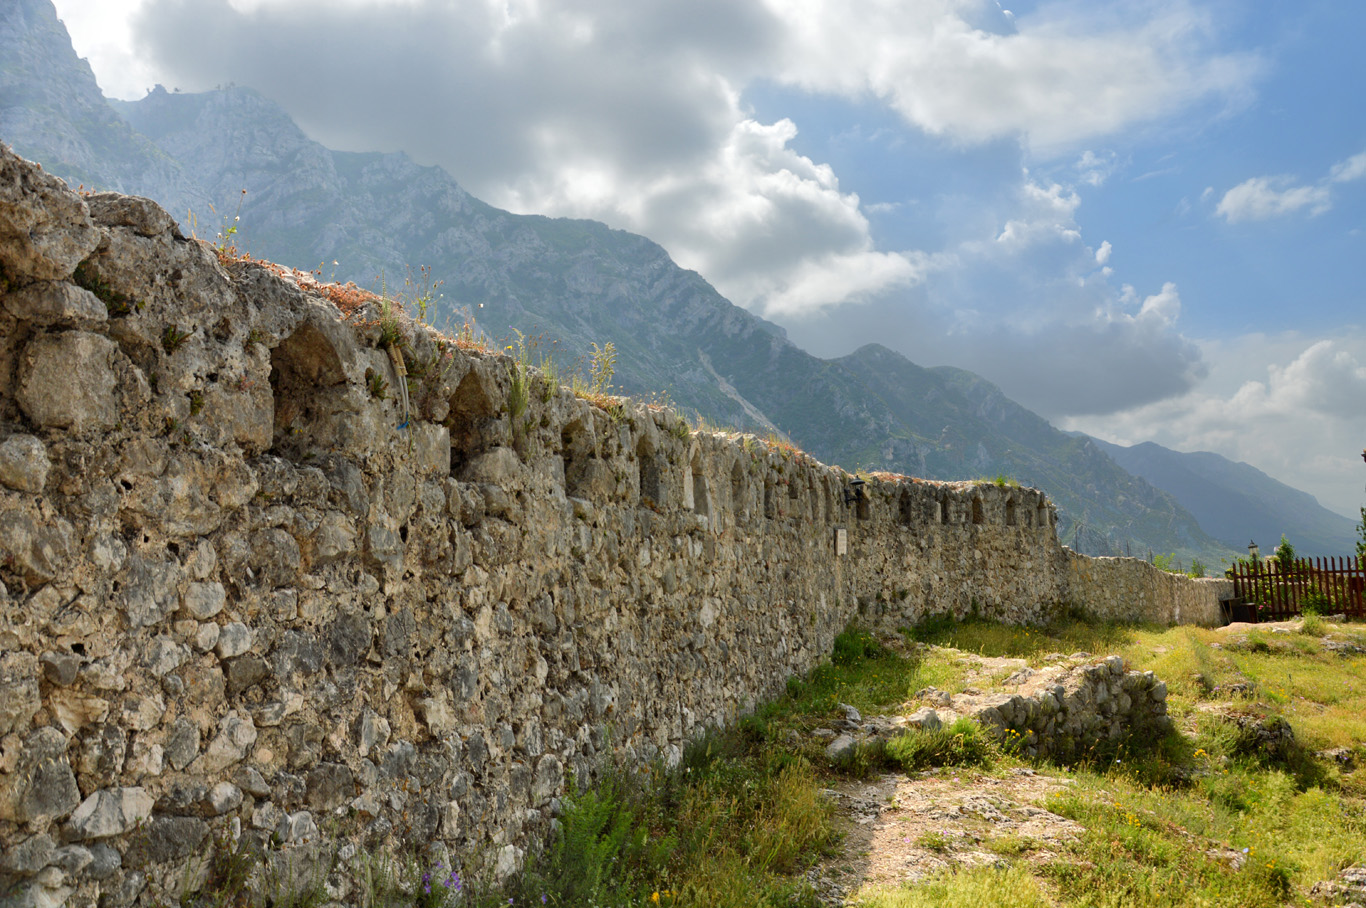 Medieval defensive walls